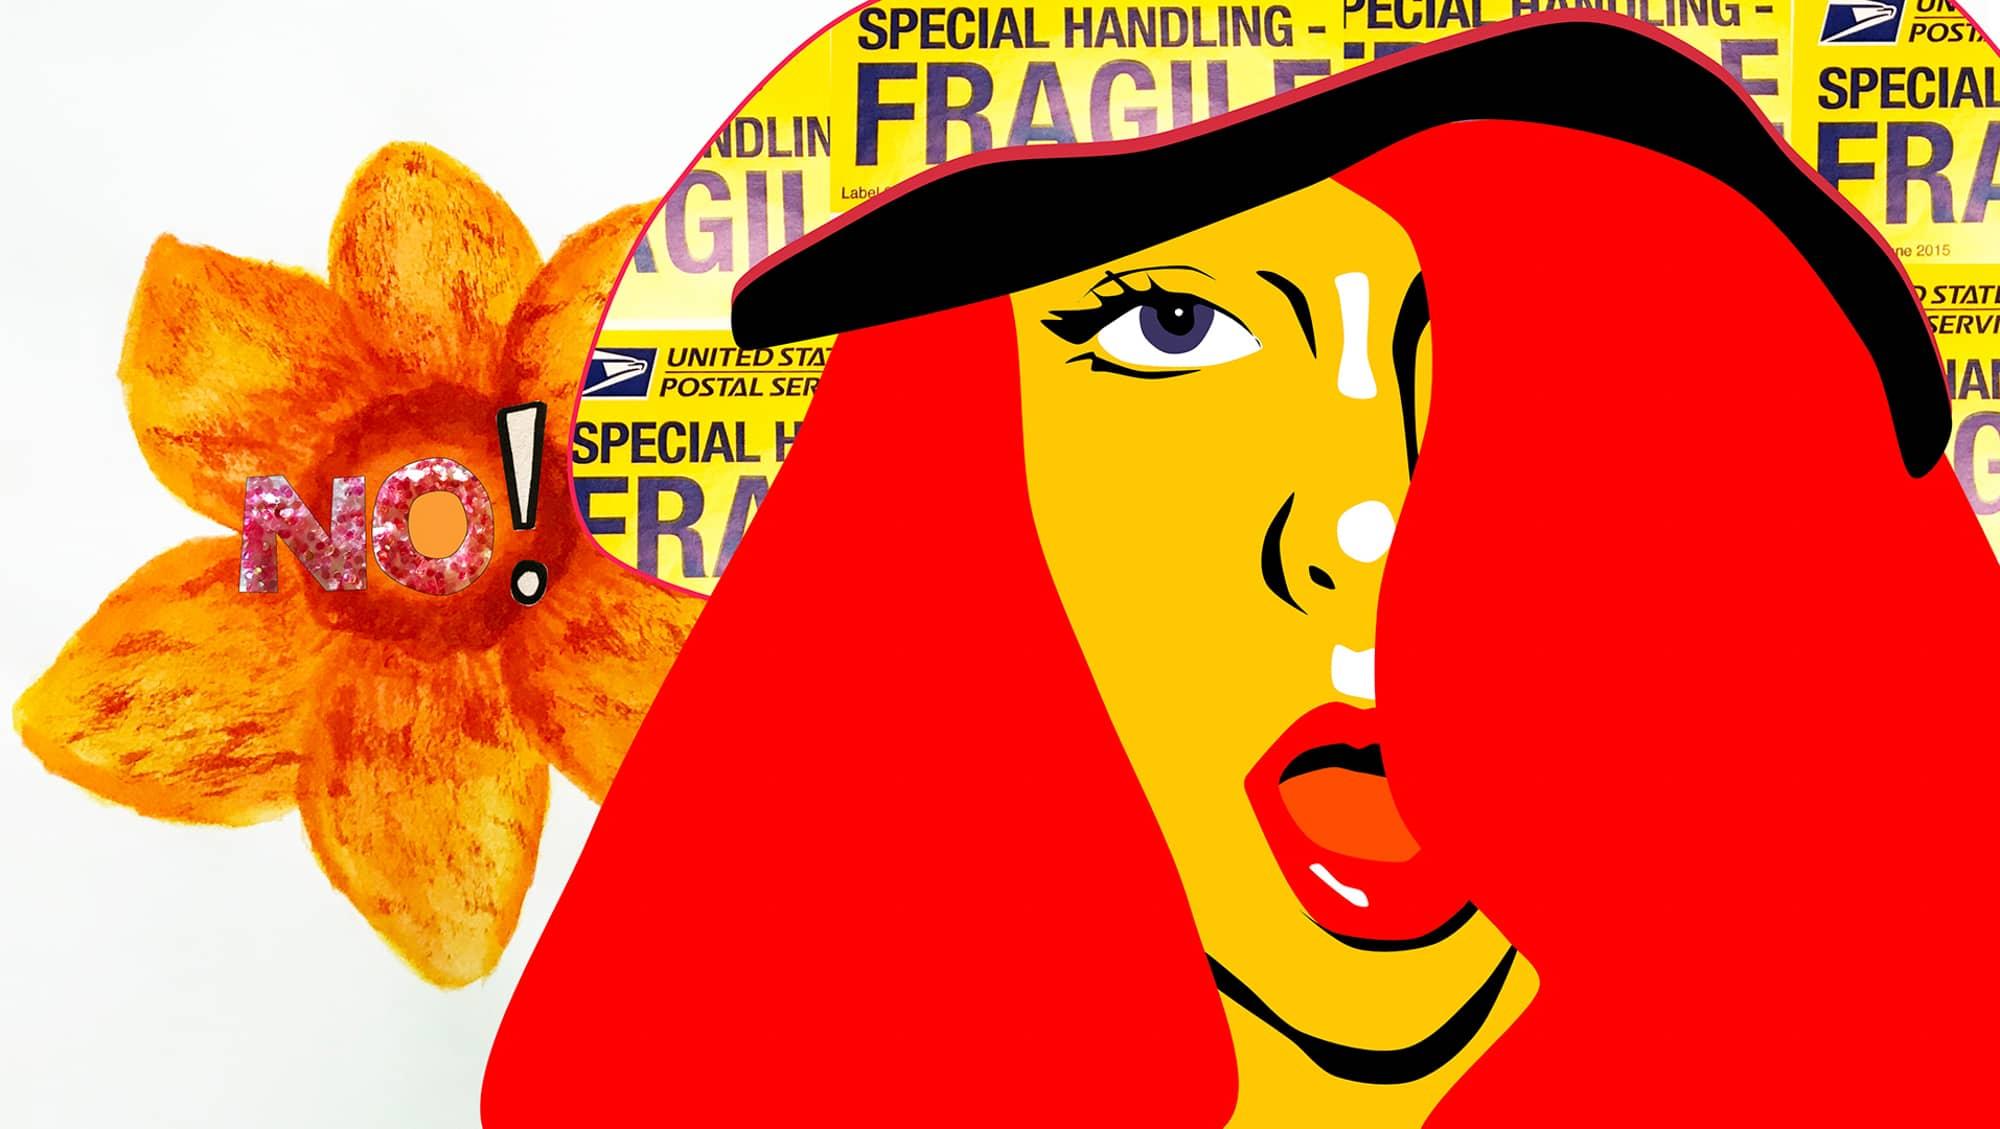 A Digital Collage of a woman by Lauren Lakin